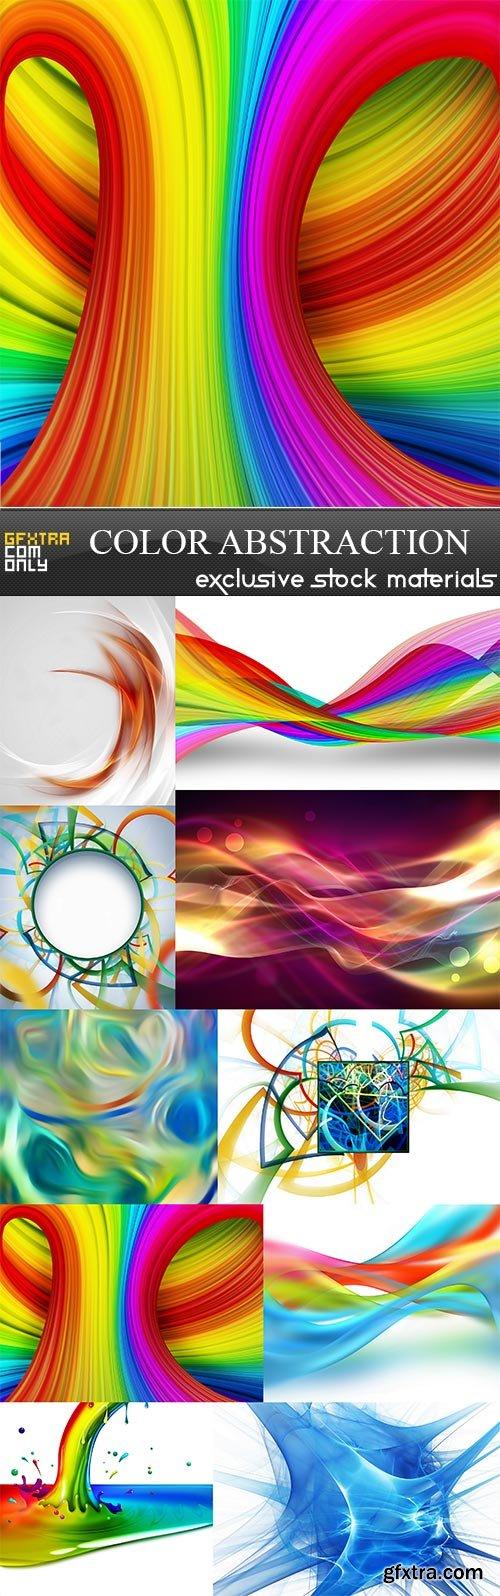 Color abstraction, 10 x UHQ JPEG